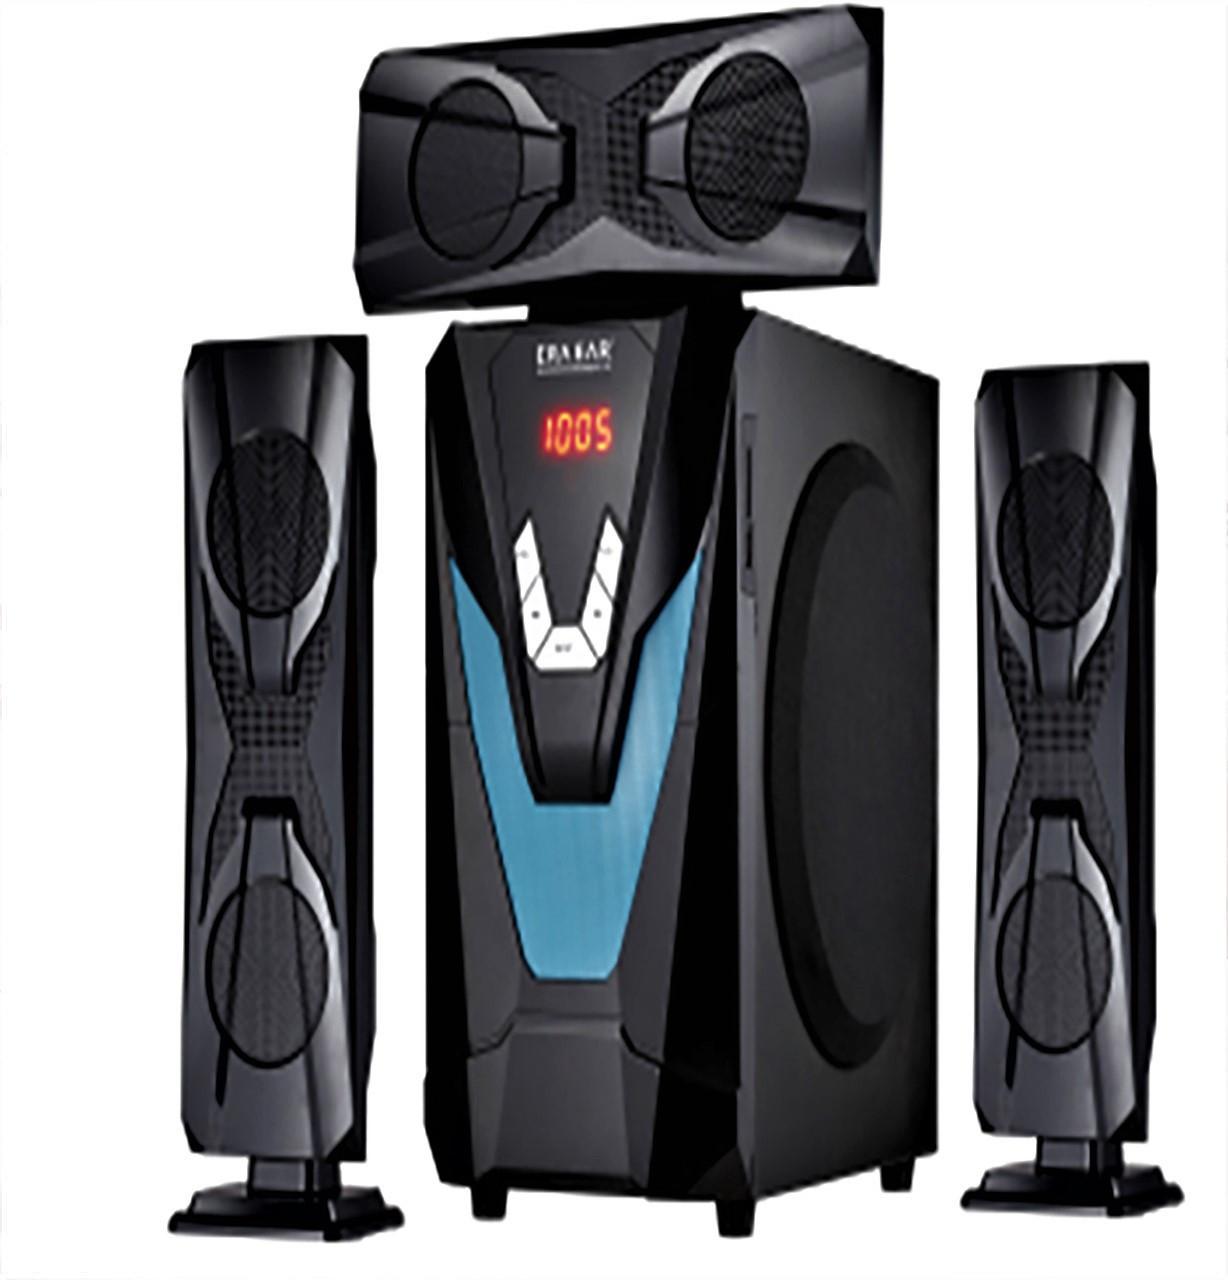 Система акустична 3.1 Era Ear E-Y3L | професійна акустична потужна колонка | домашній кінотеатр